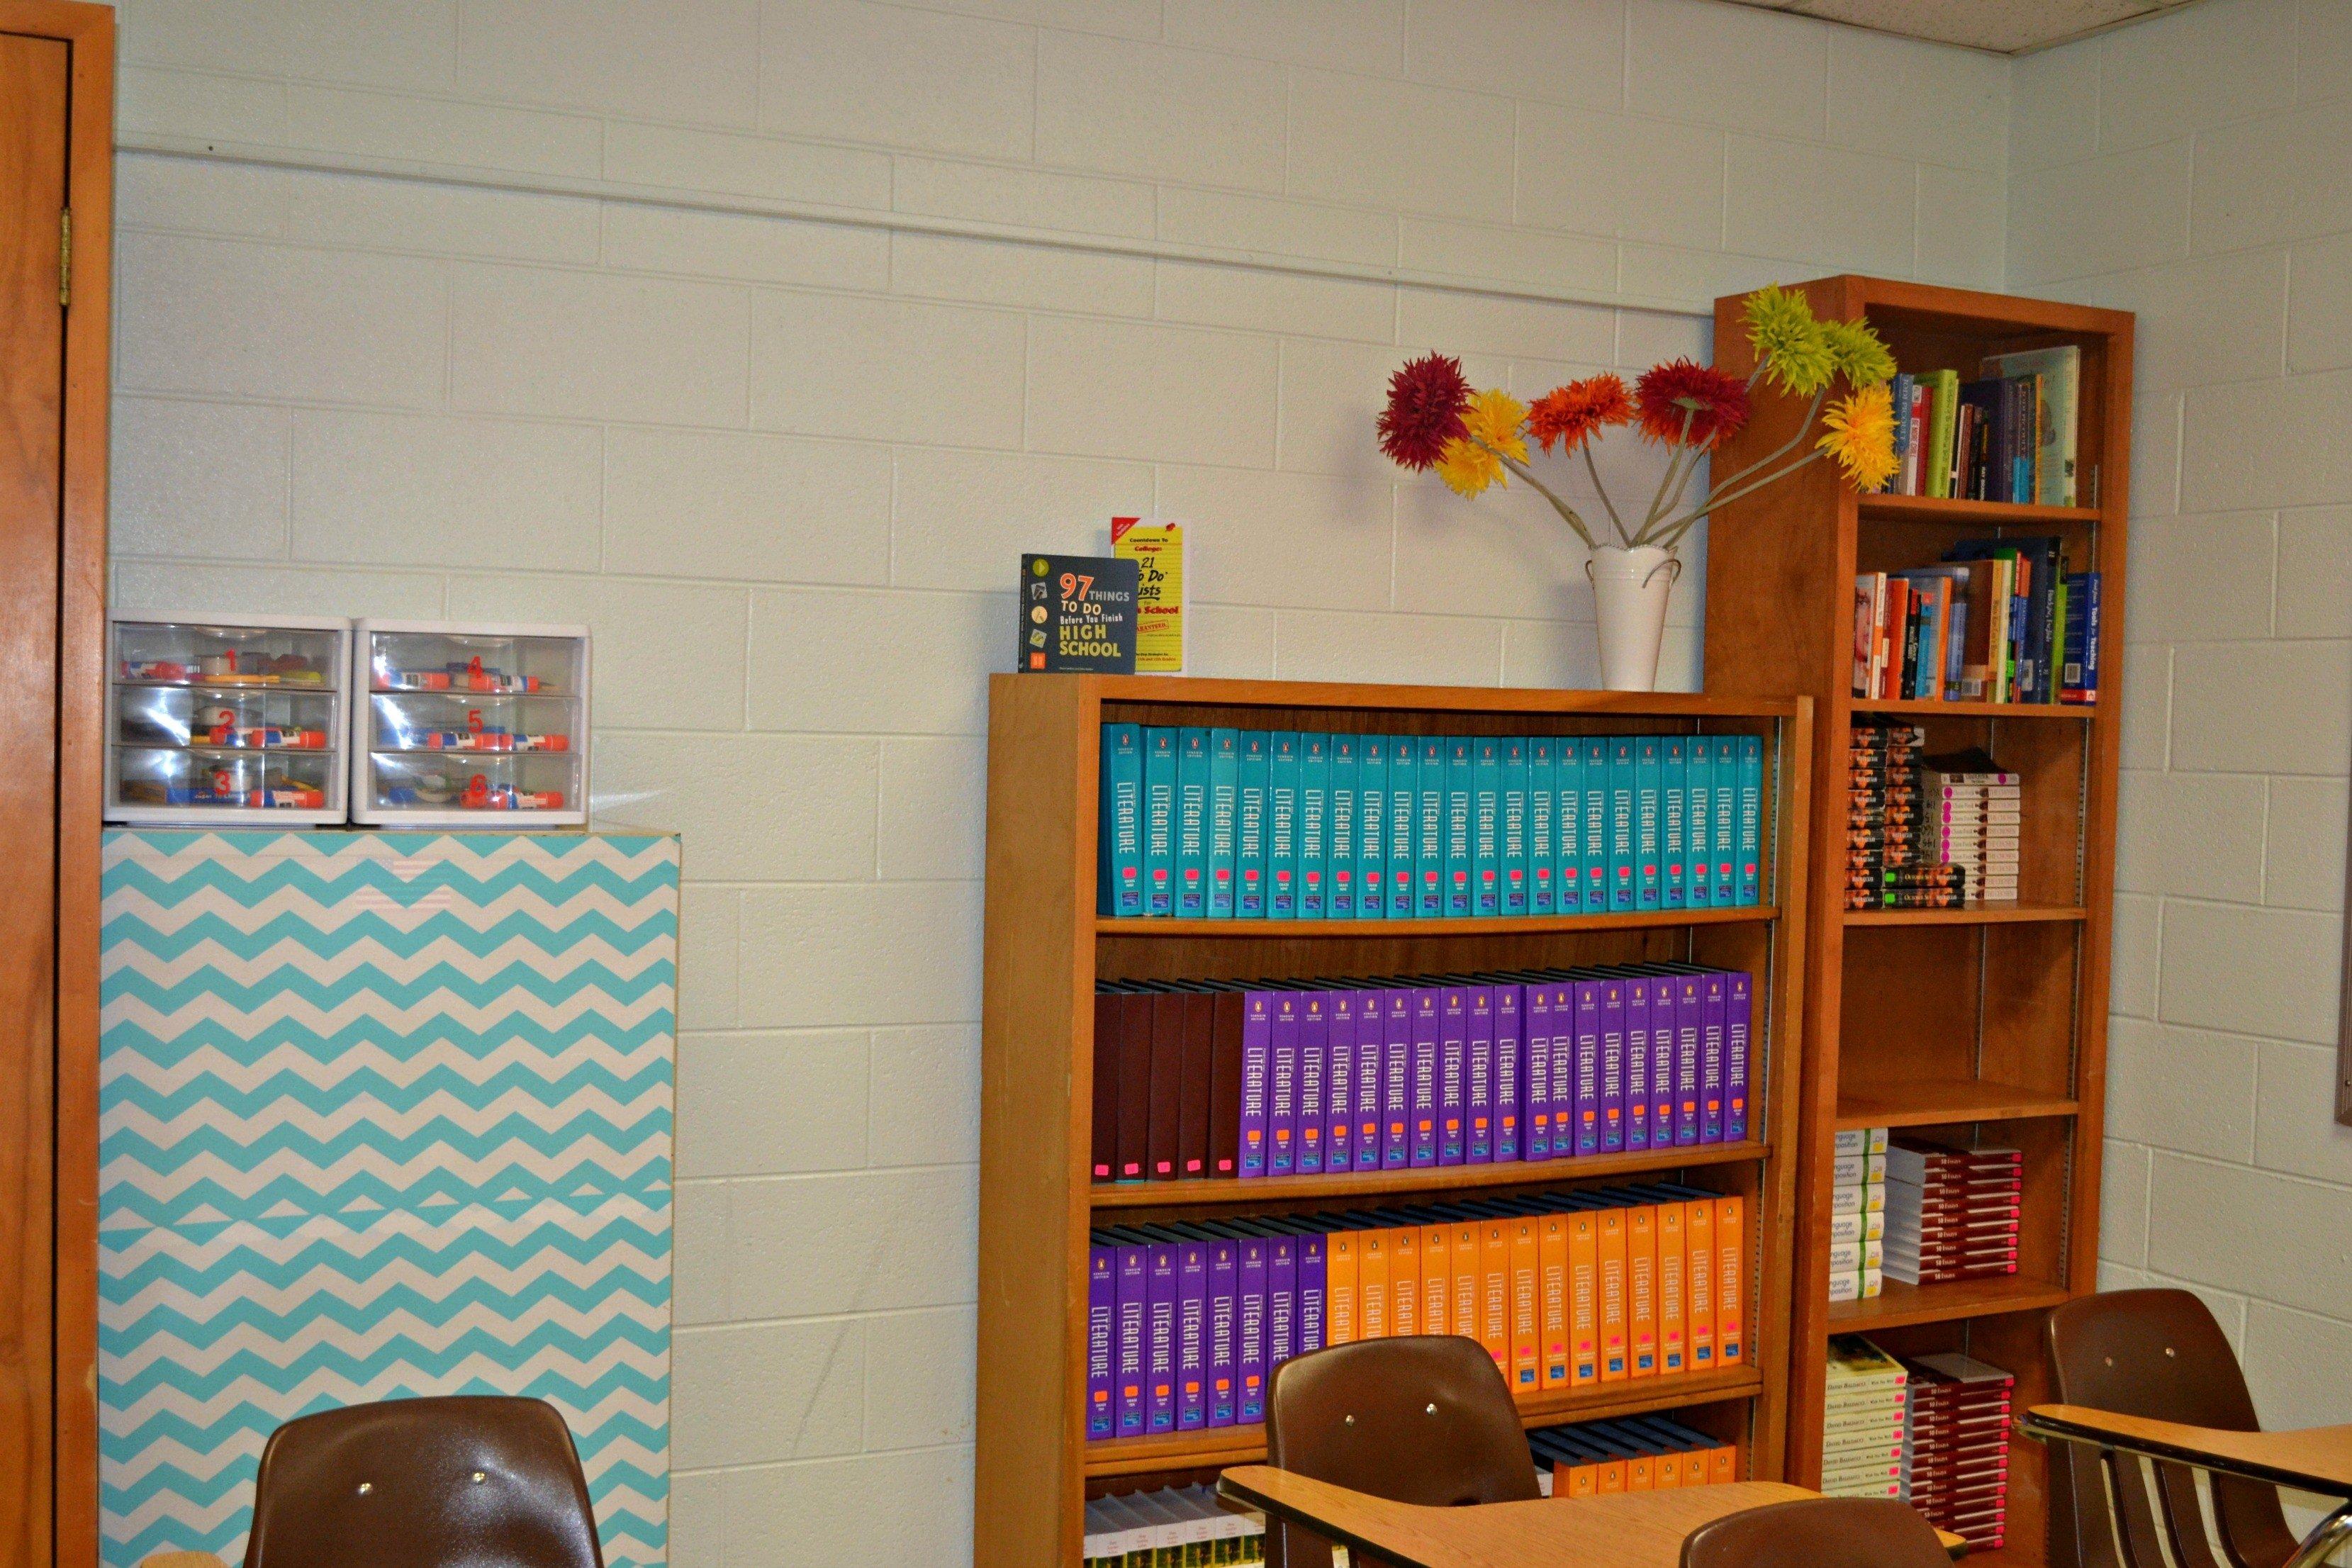 10 Beautiful High School Classroom Decorating Ideas decoration organization for the high school classroom teaching 1 & 10 Beautiful High School Classroom Decorating Ideas